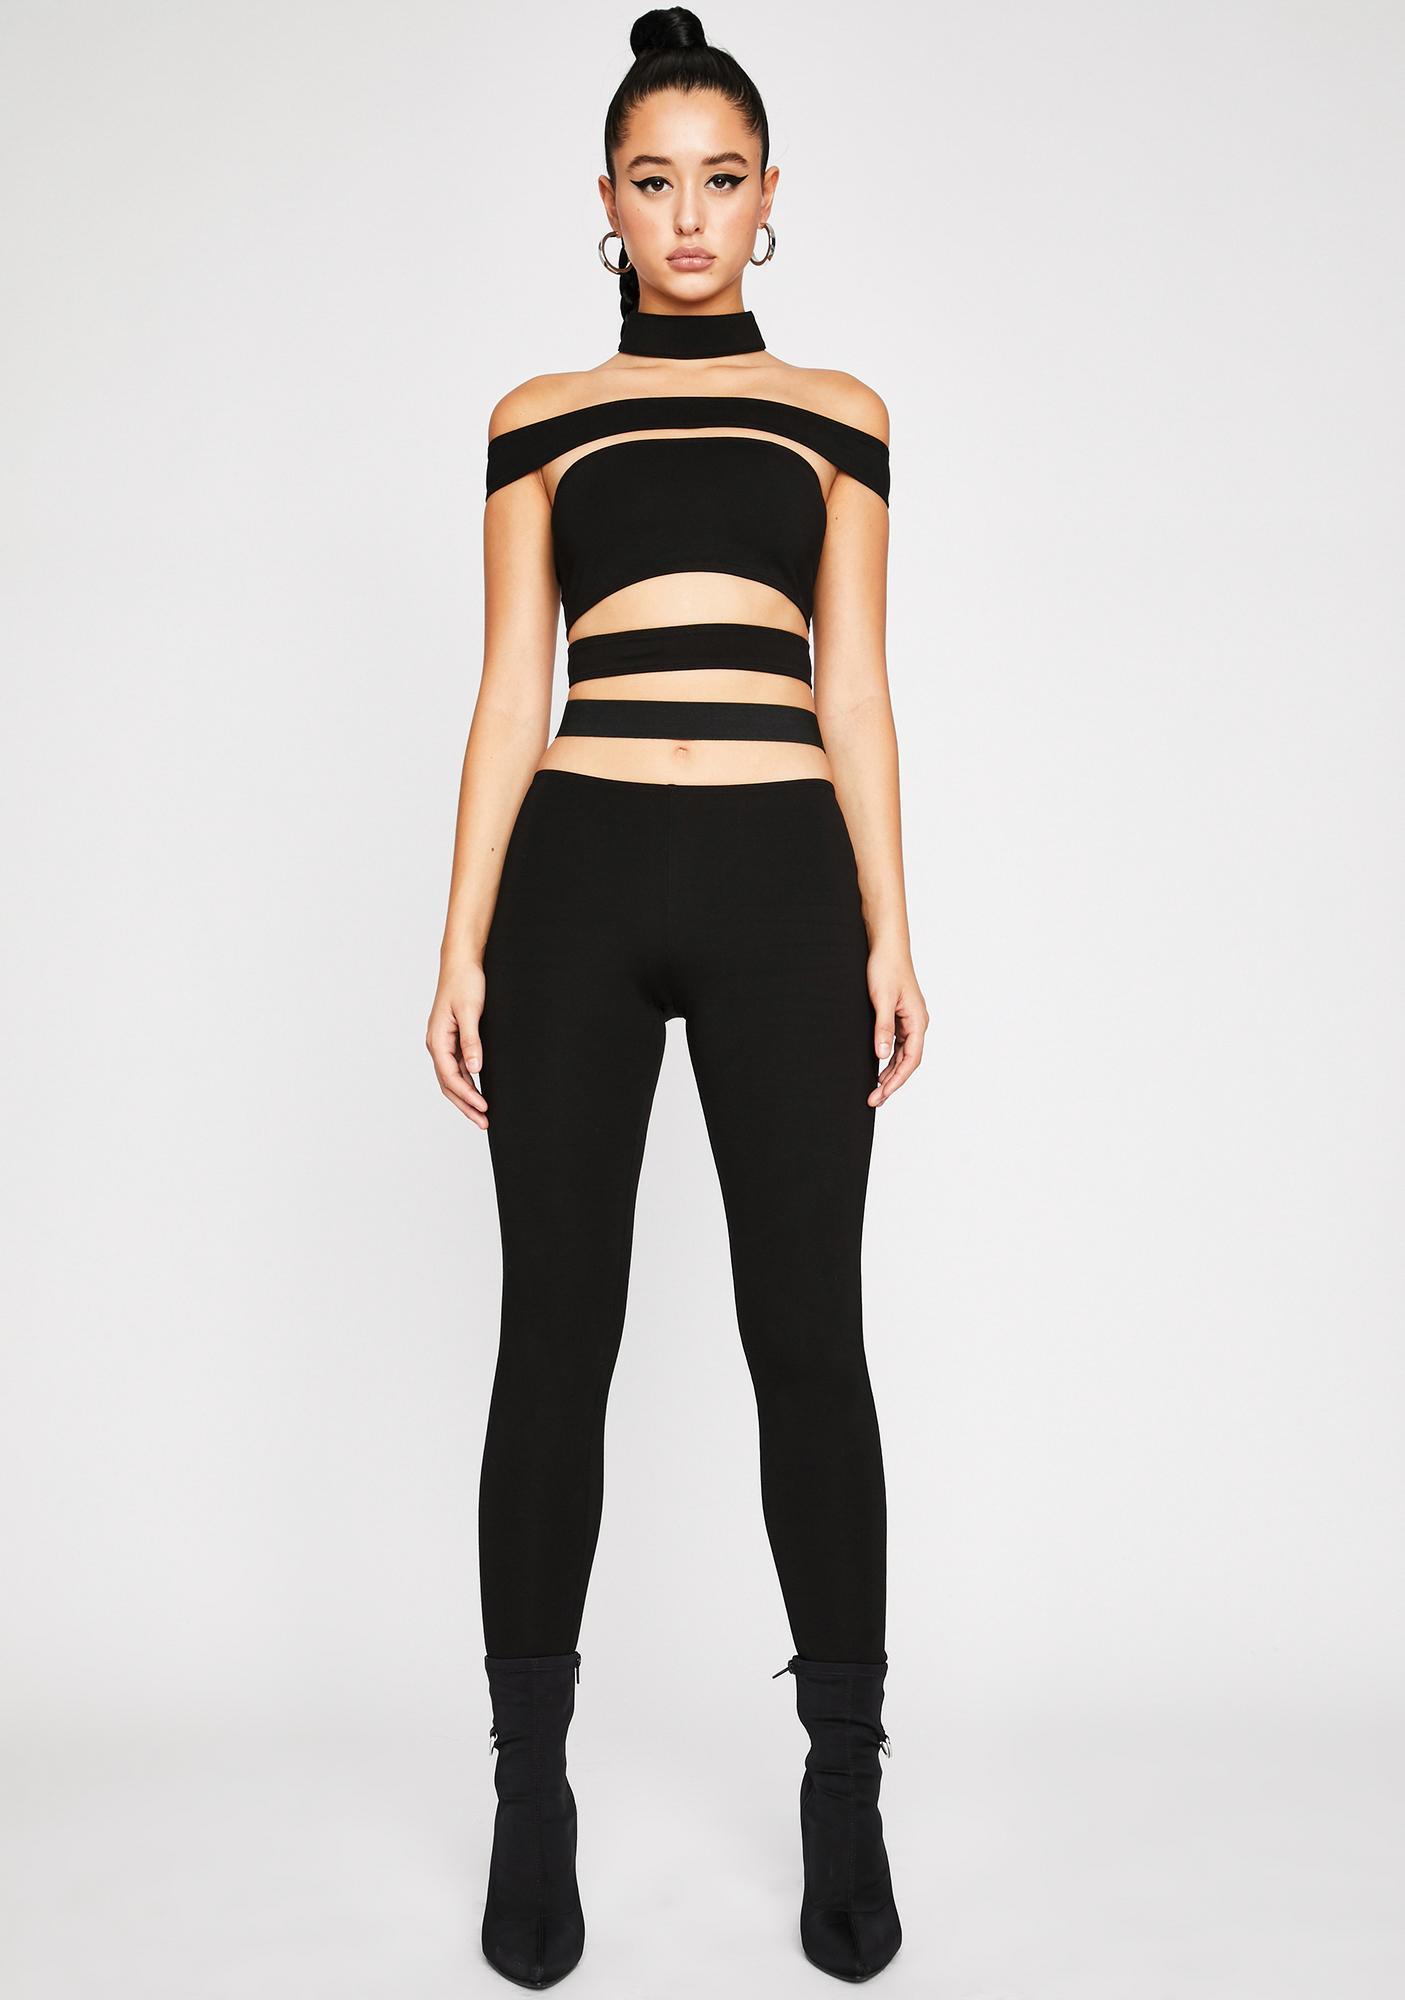 Poster Grl Fashion Needs Me Pant Set